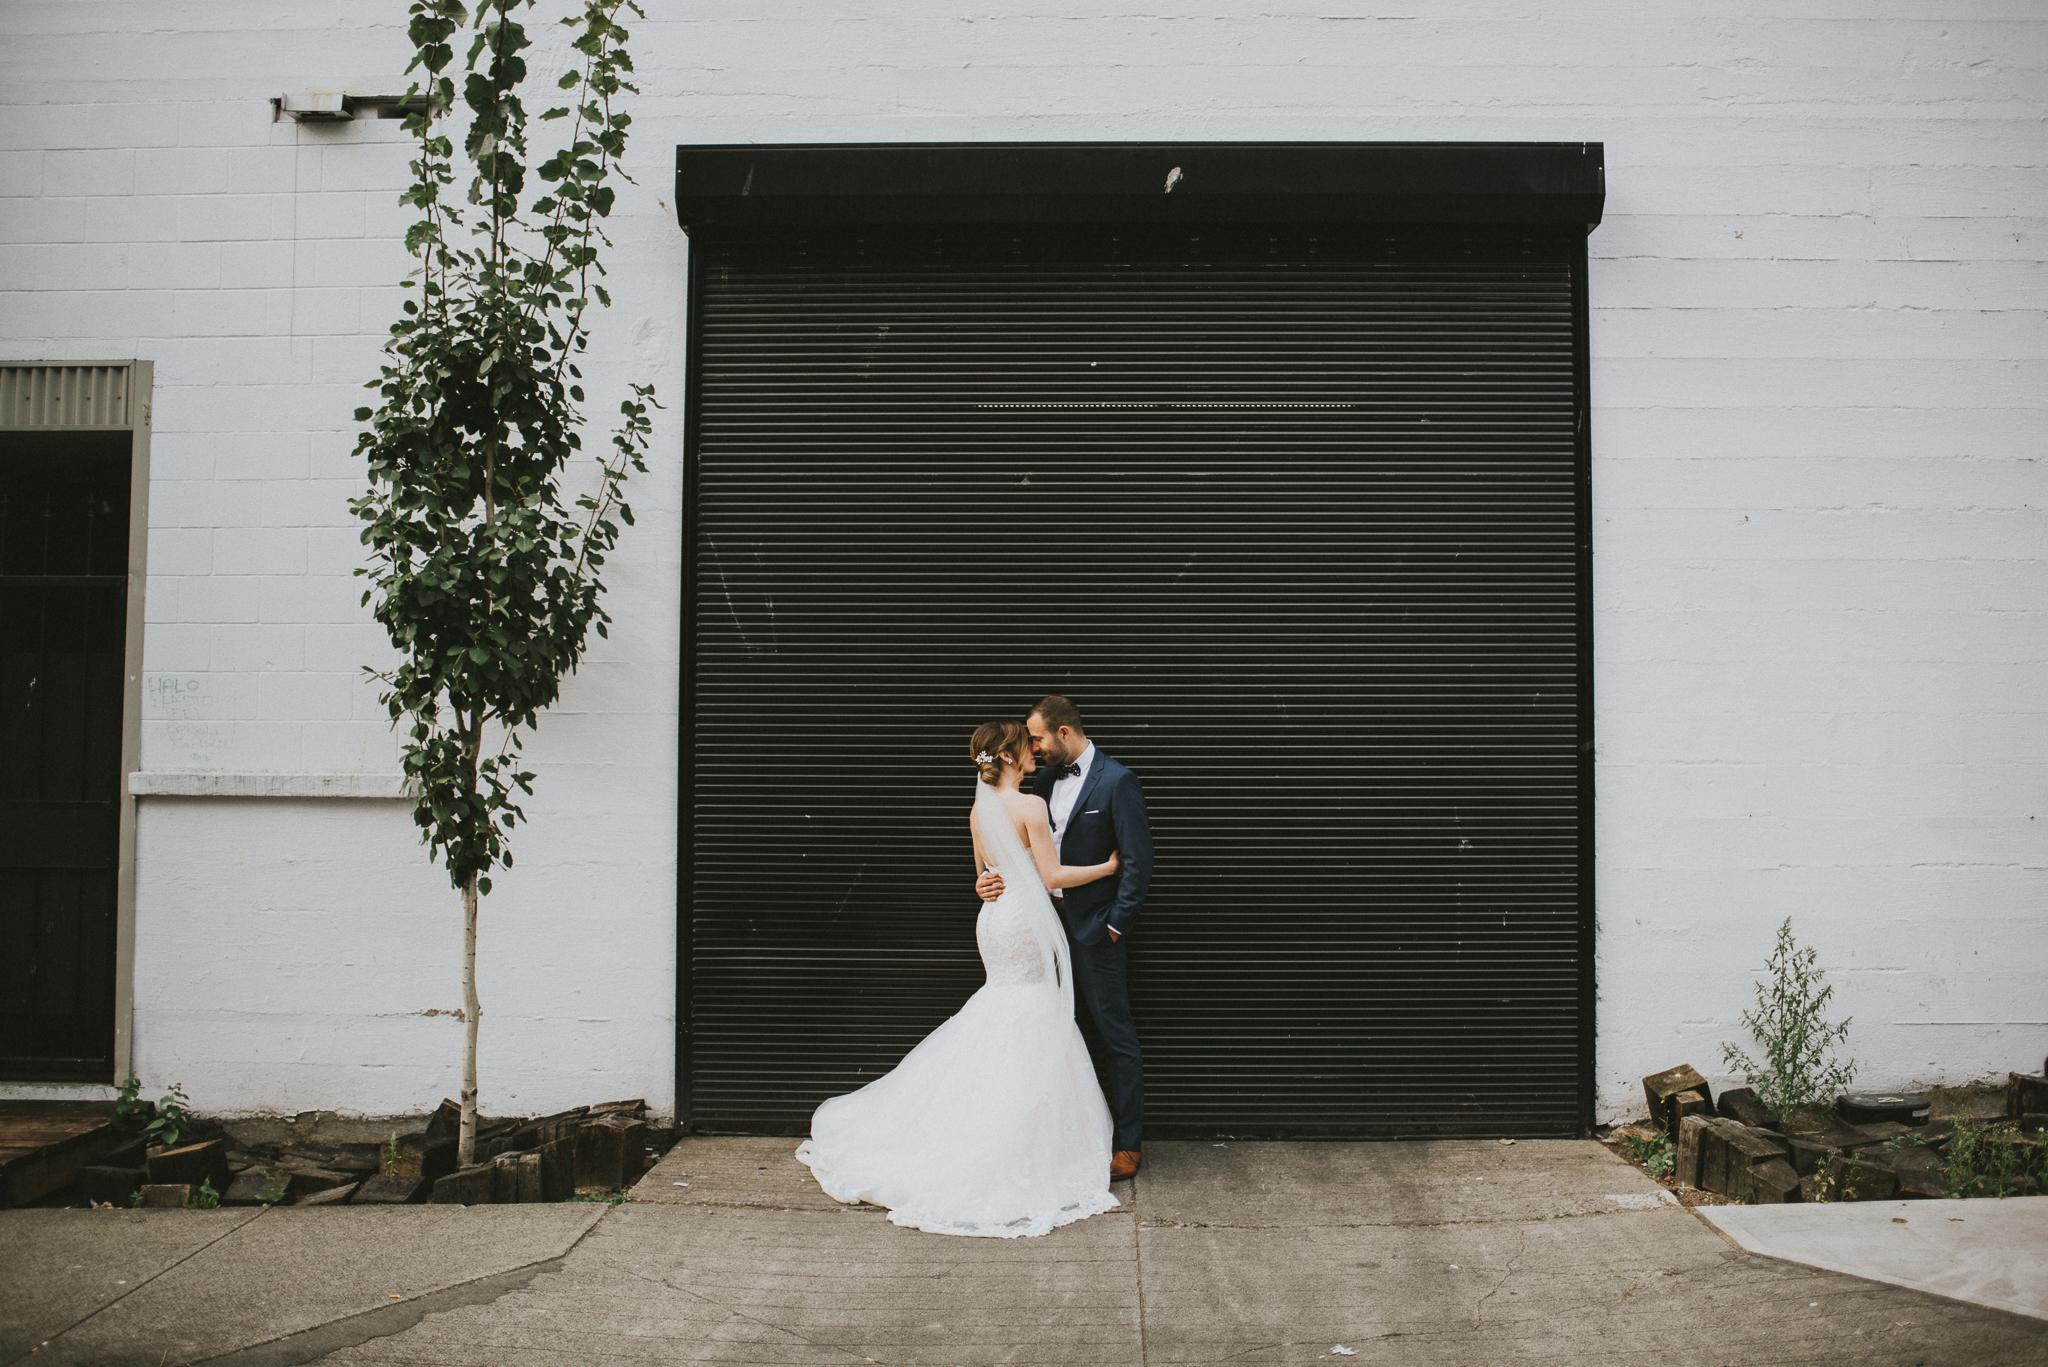 122-permanent-vancouver-wedding-courtneysteven-web-8484.jpg